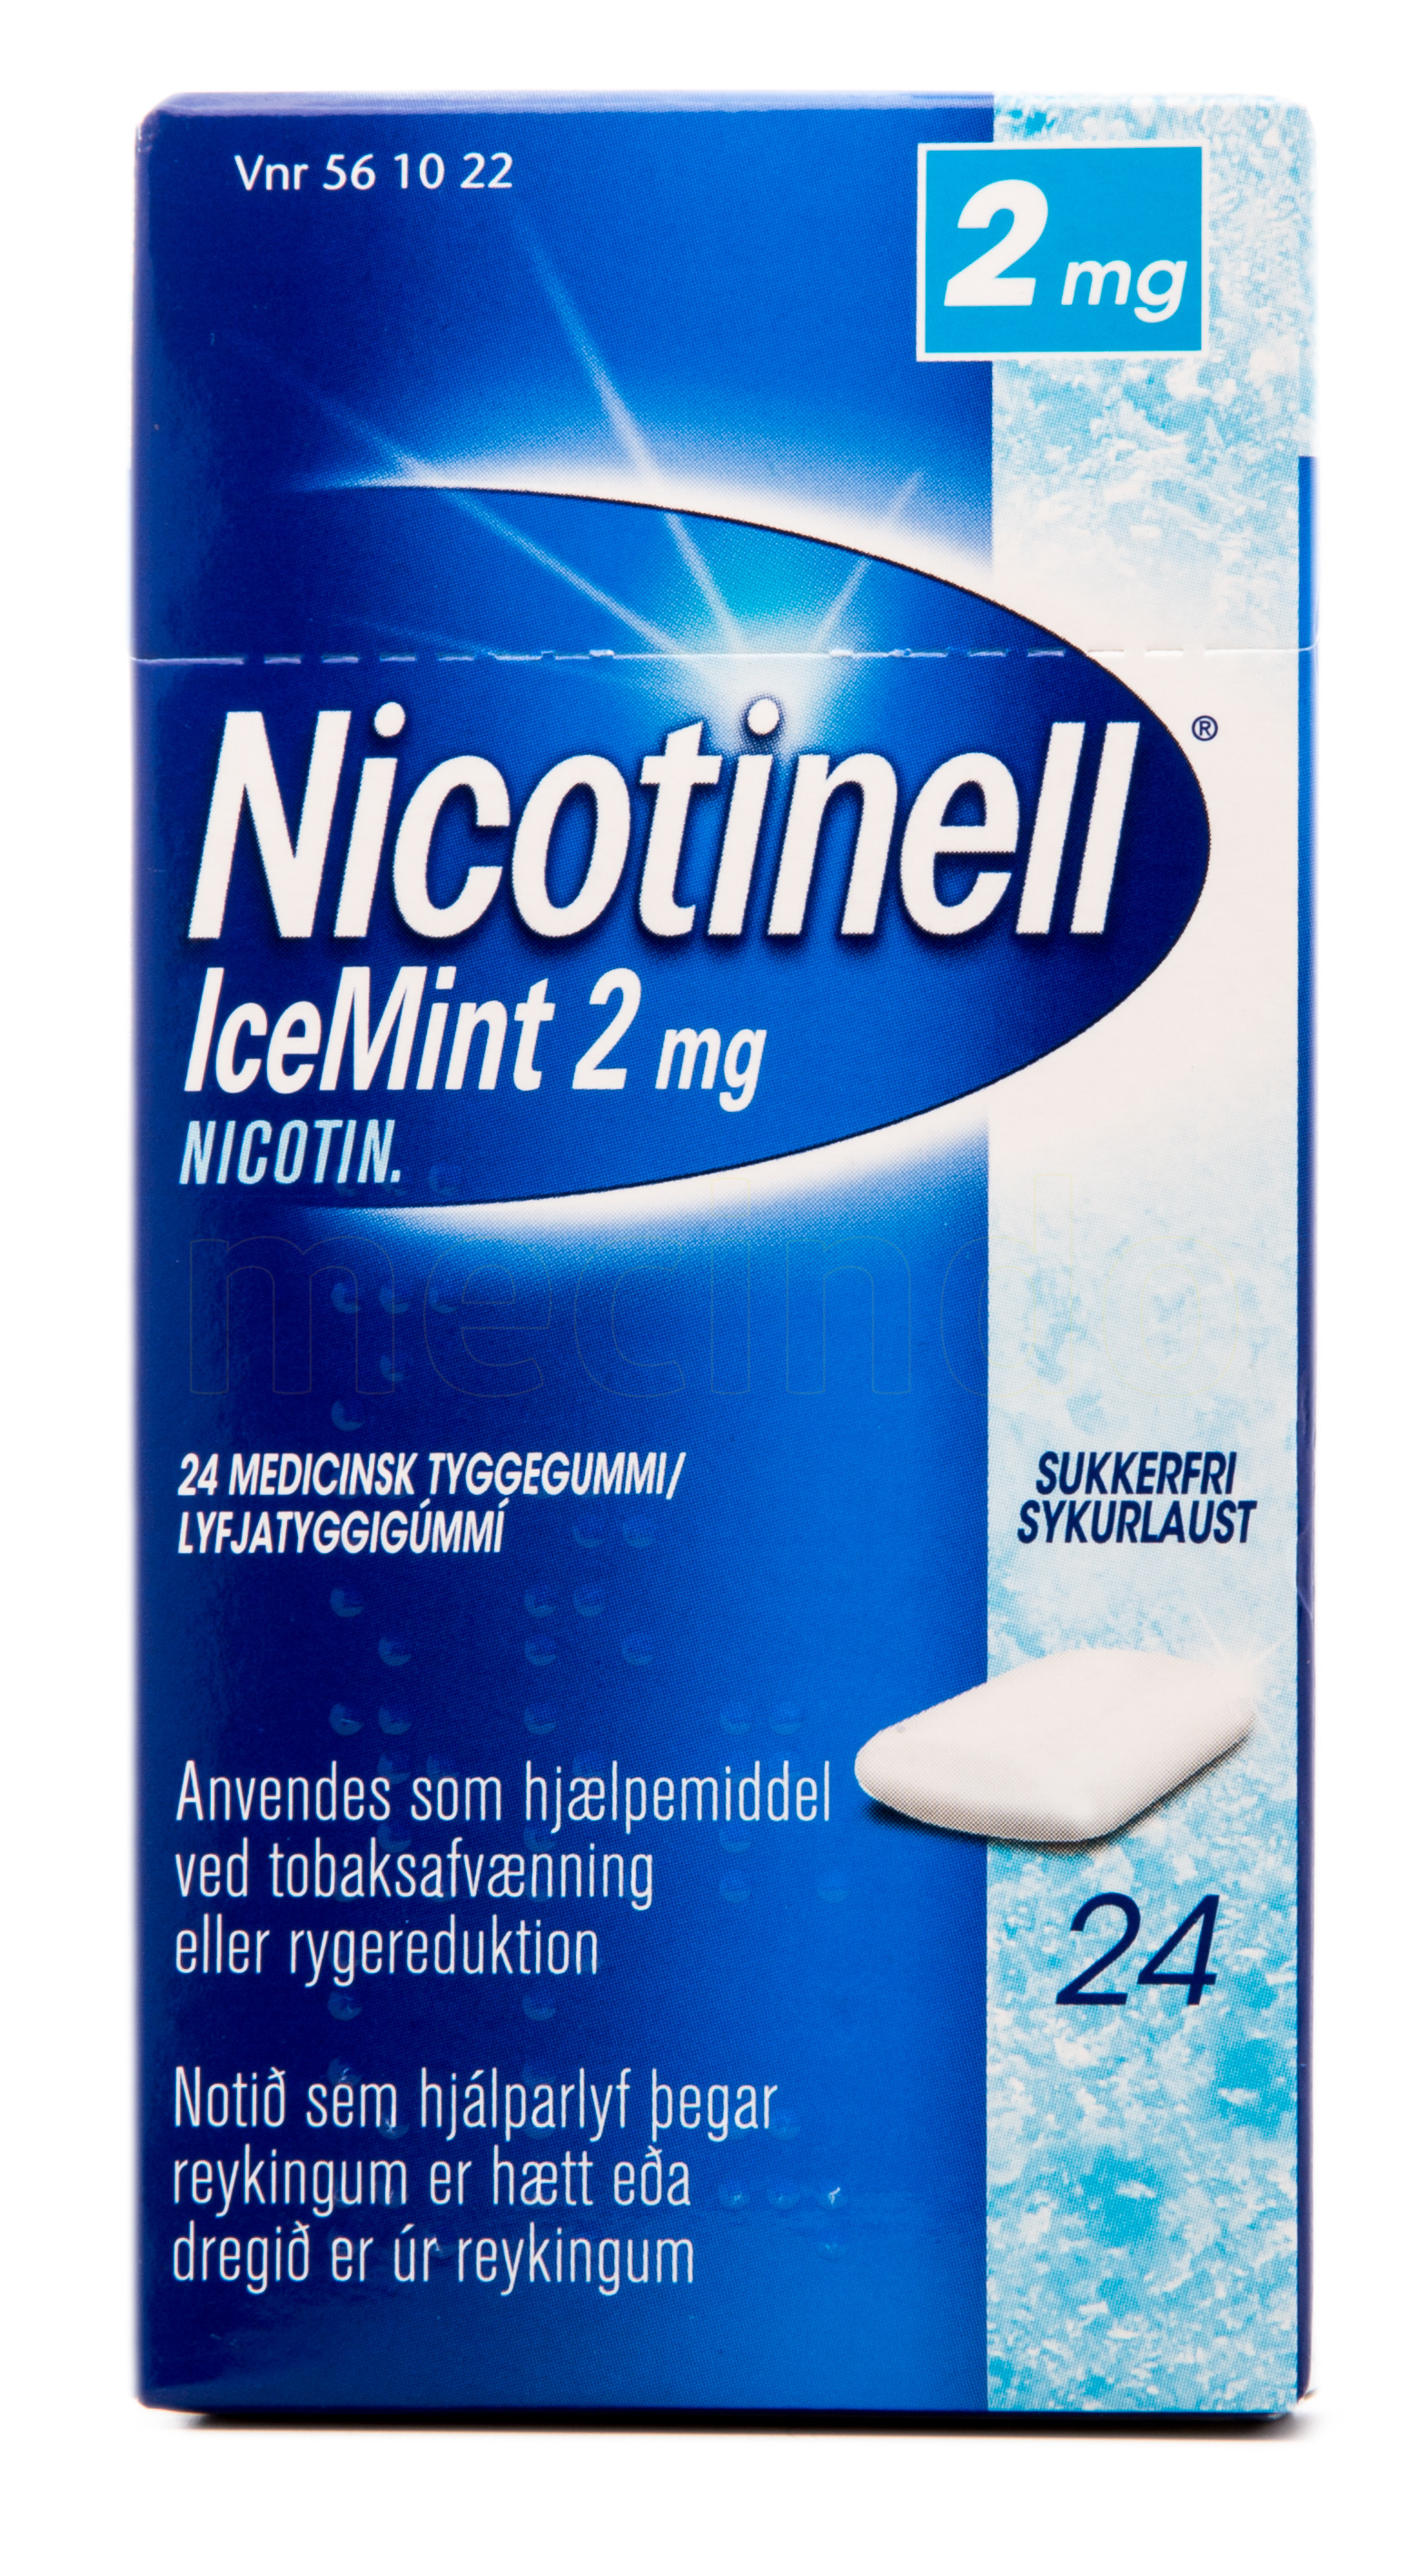 Billede af Nicotinell Tyggegummi IceMint - 2 mg - 24 Stk.